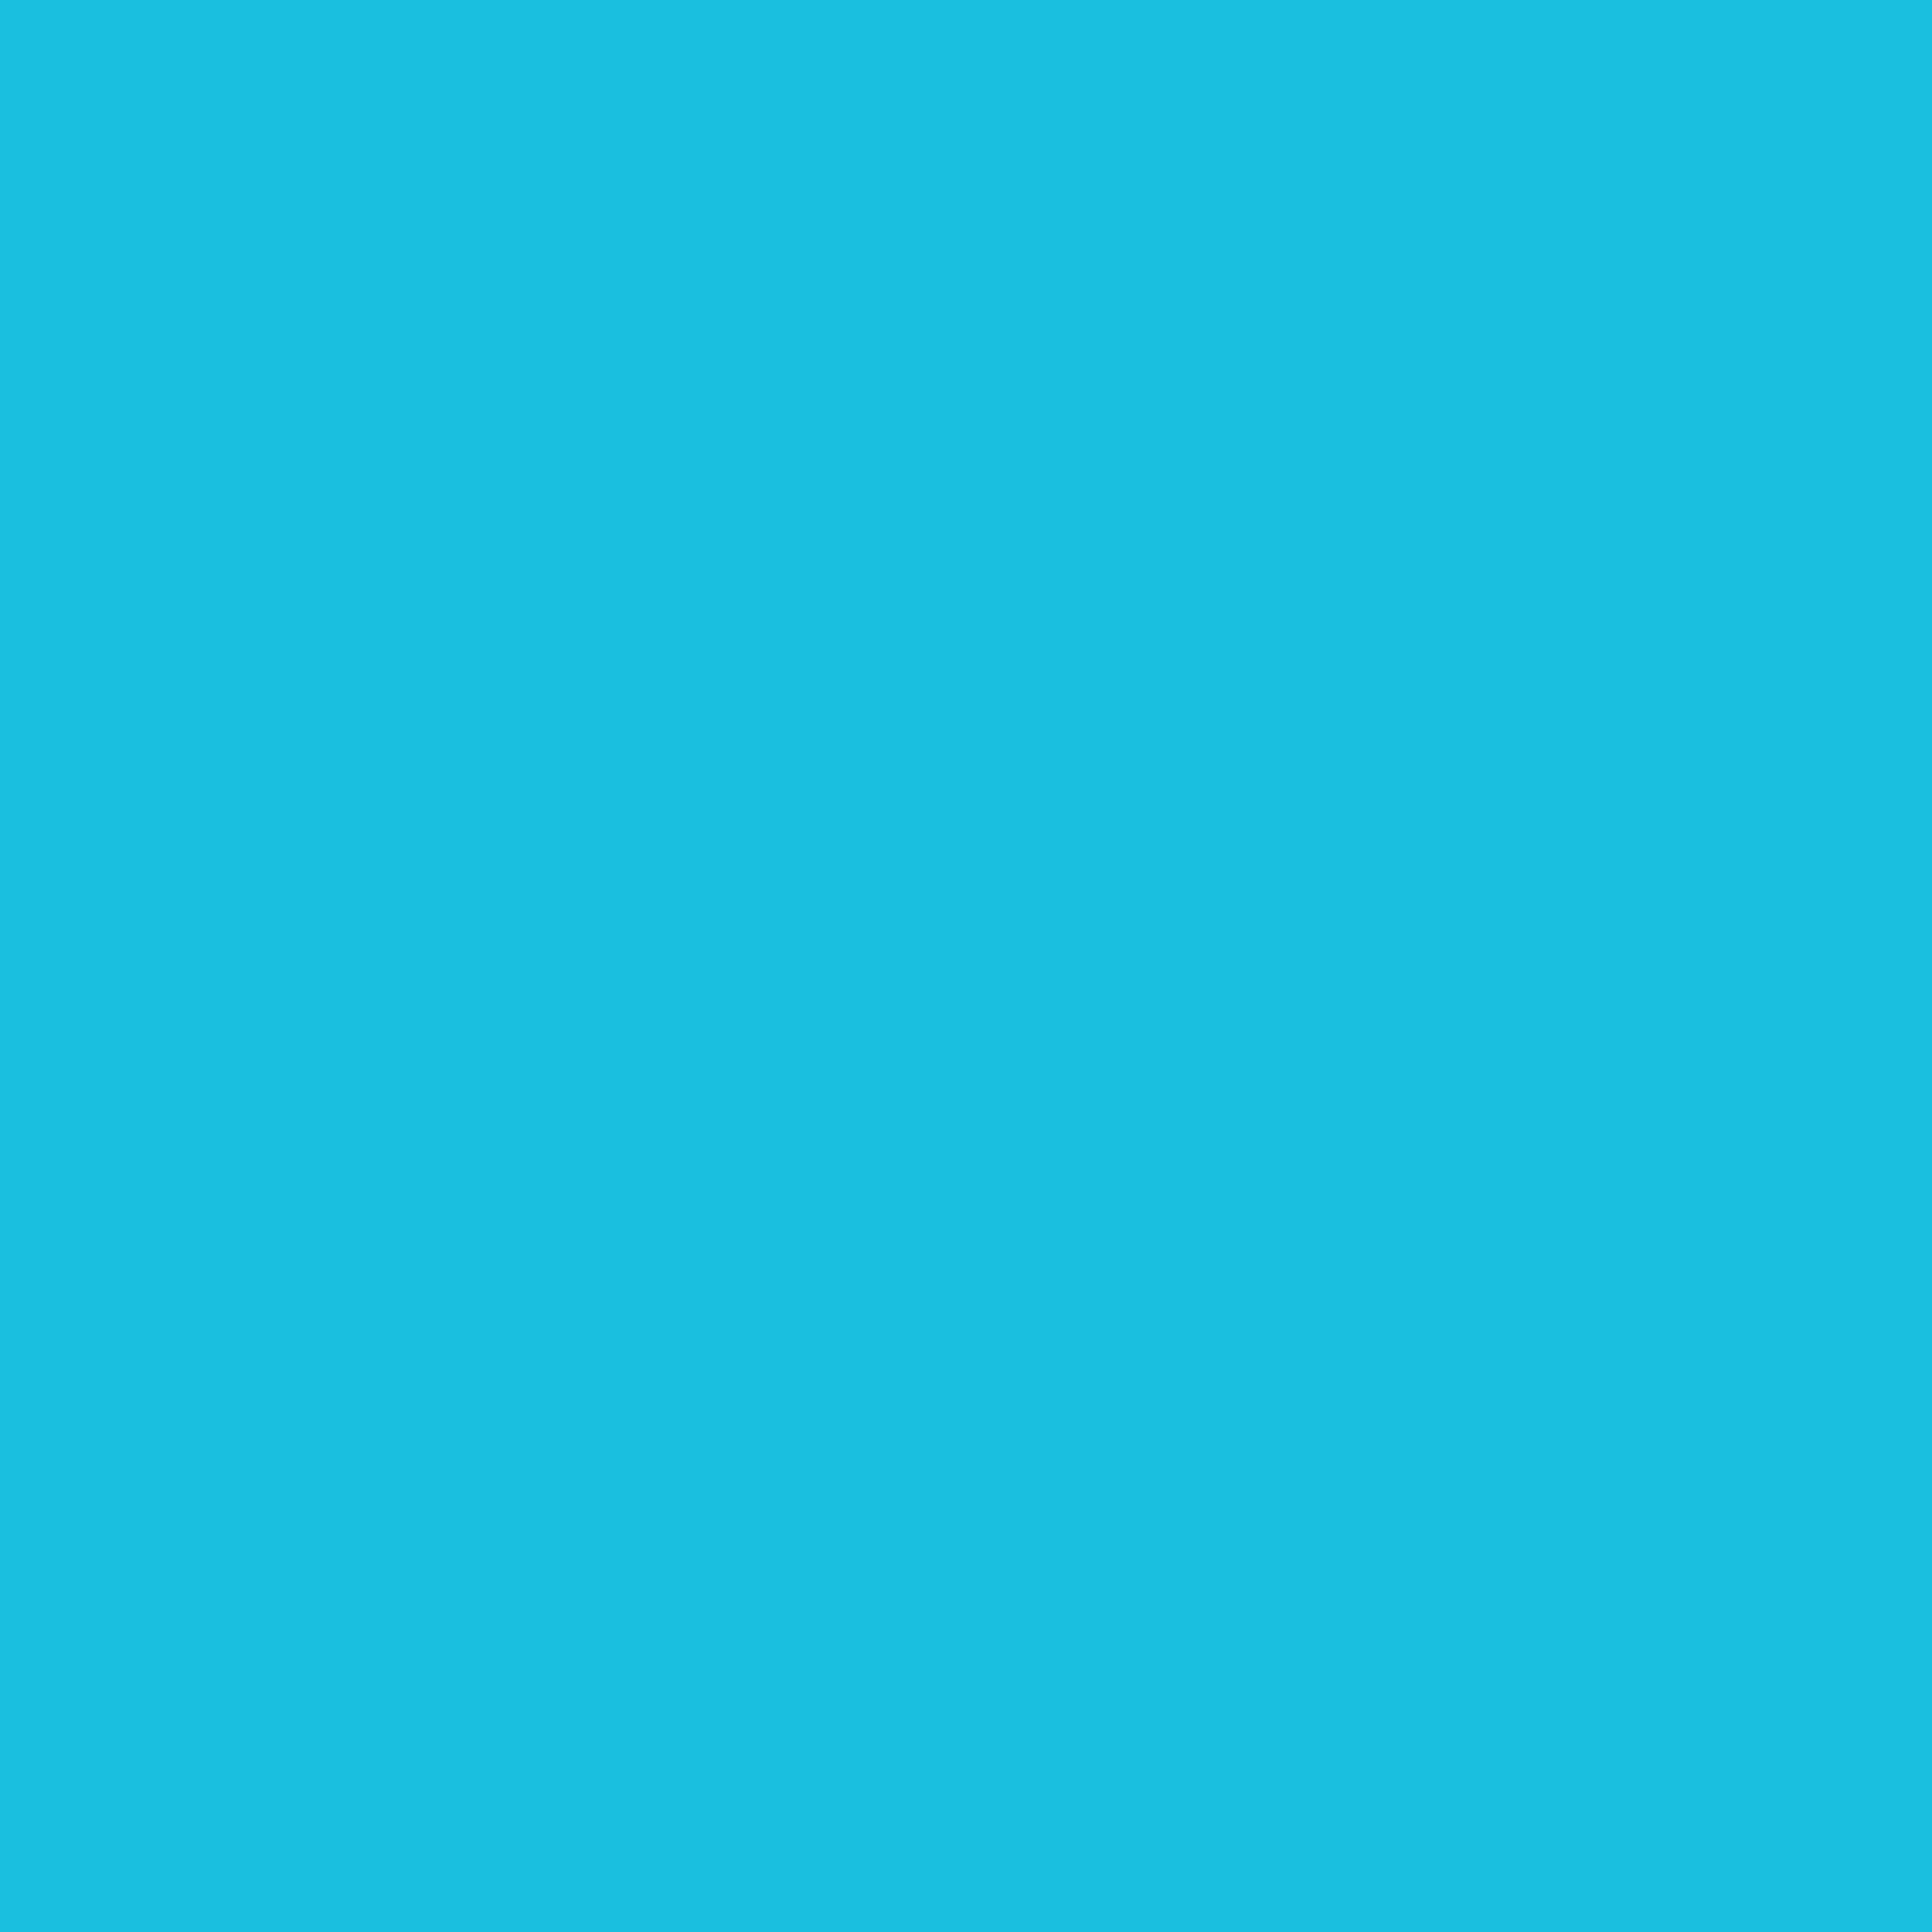 Pantone 311   HEX: #00BFDF   RGB: 0, 191, 223   CMYK: 70, 0, 10, 0